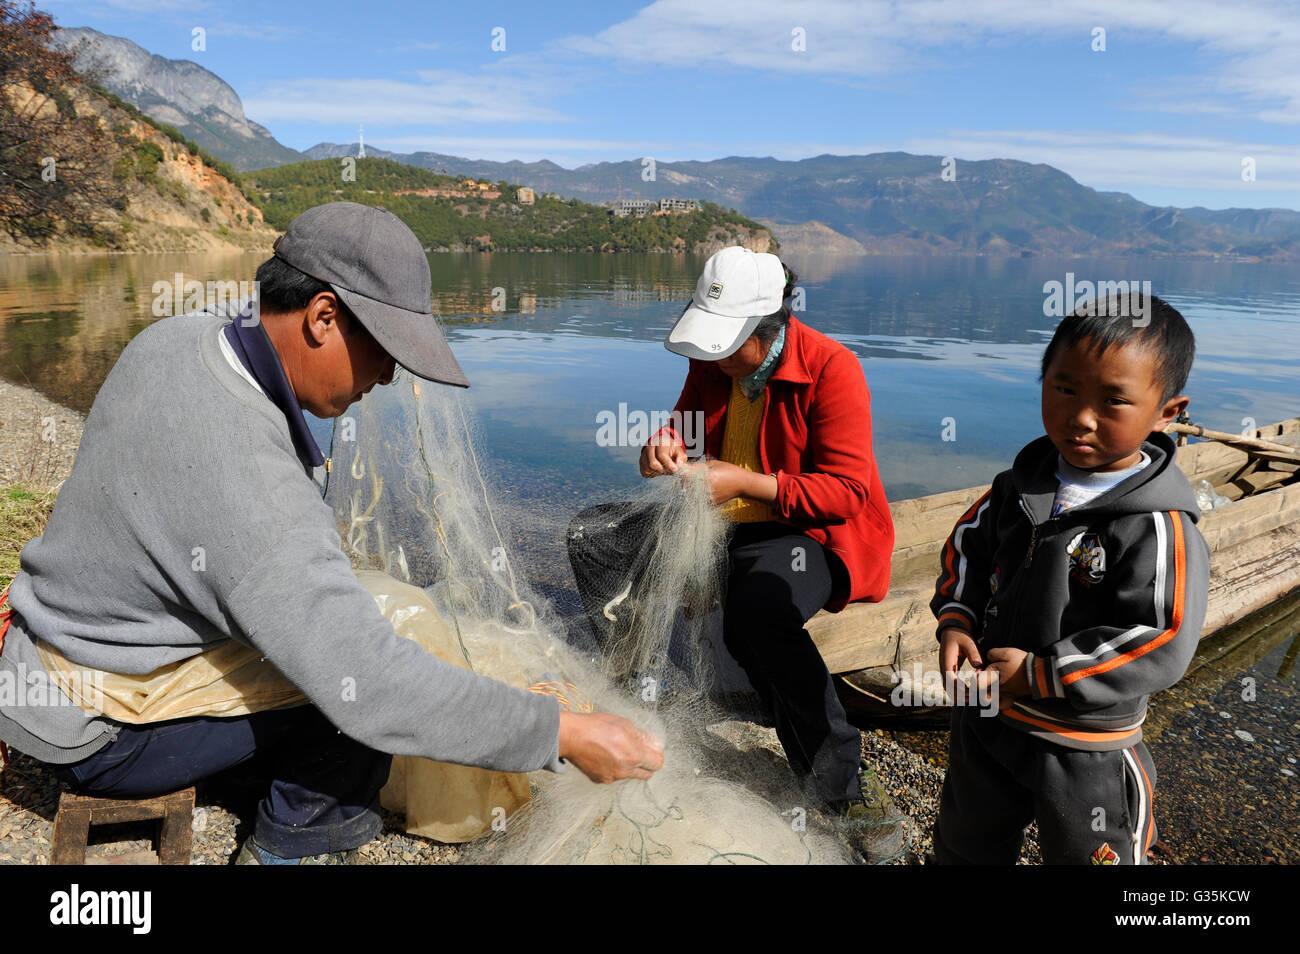 CHINA Yunnan Lugu Lake, family and fishing net /CHINA Provinz Yunnan , Lugu See, Familie mit Fischernetz - Stock Image